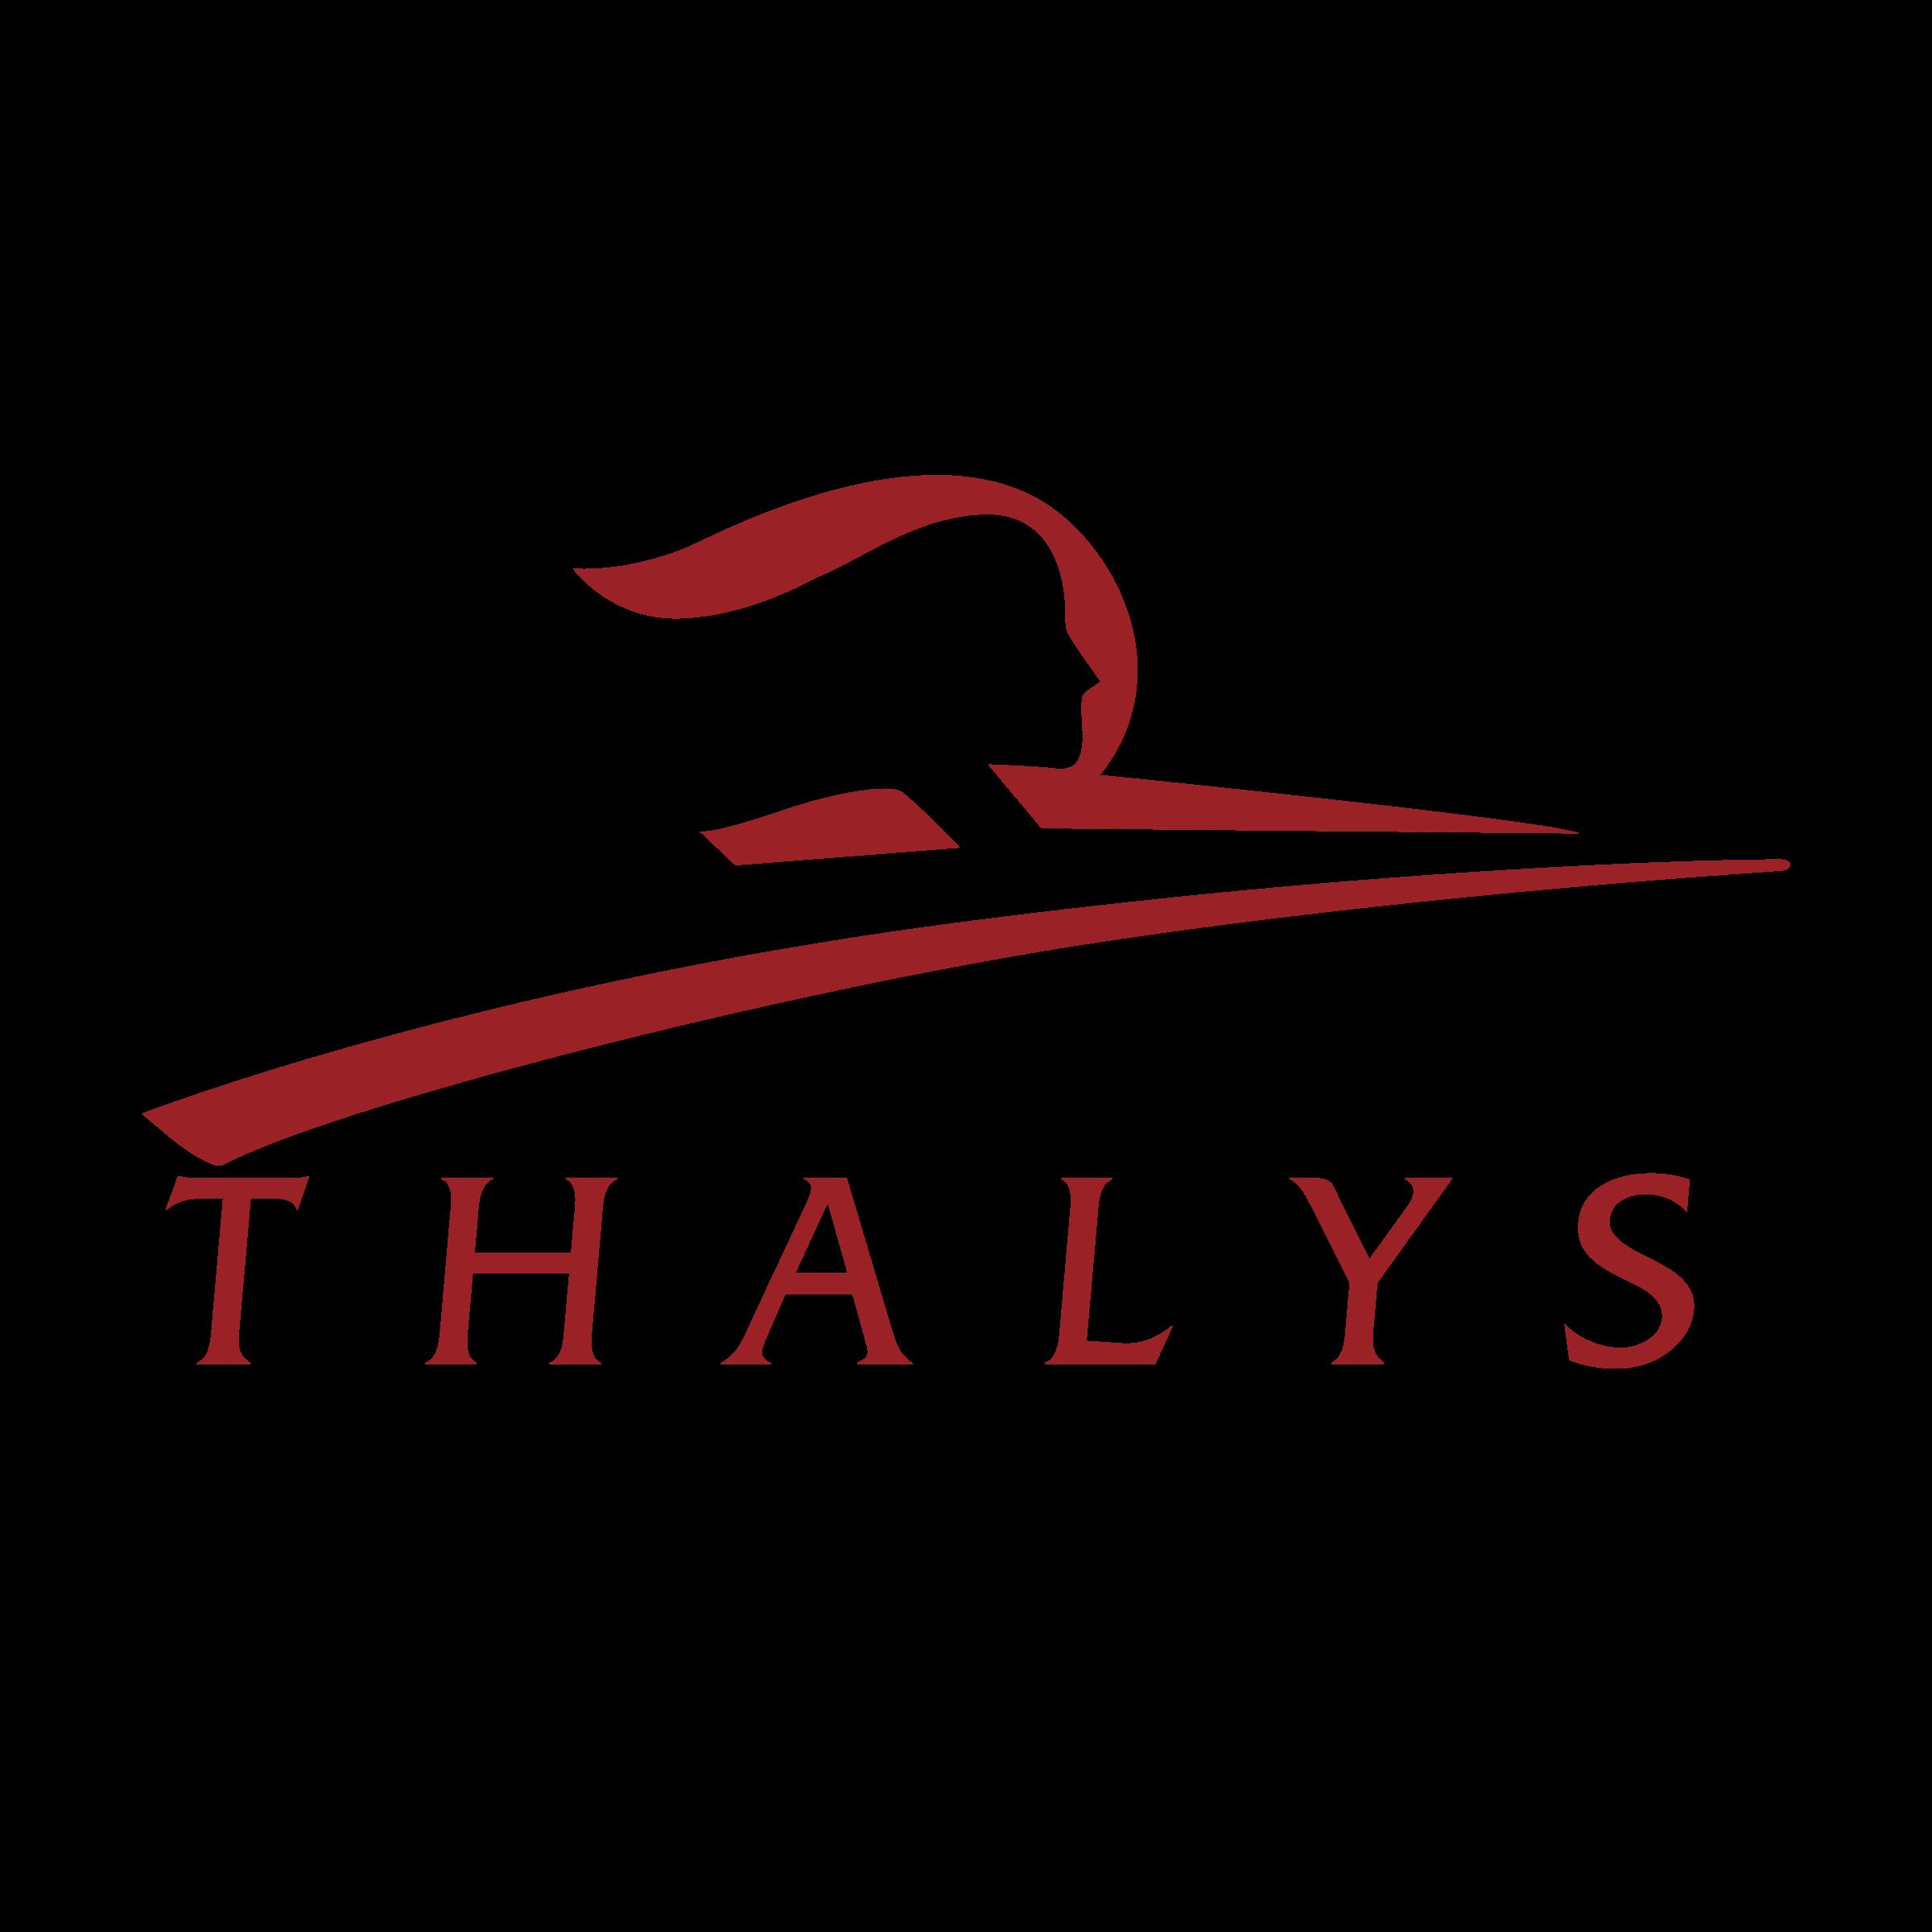 http://globalnamingnetwork.com/gnn-client-portfolio/thalys/